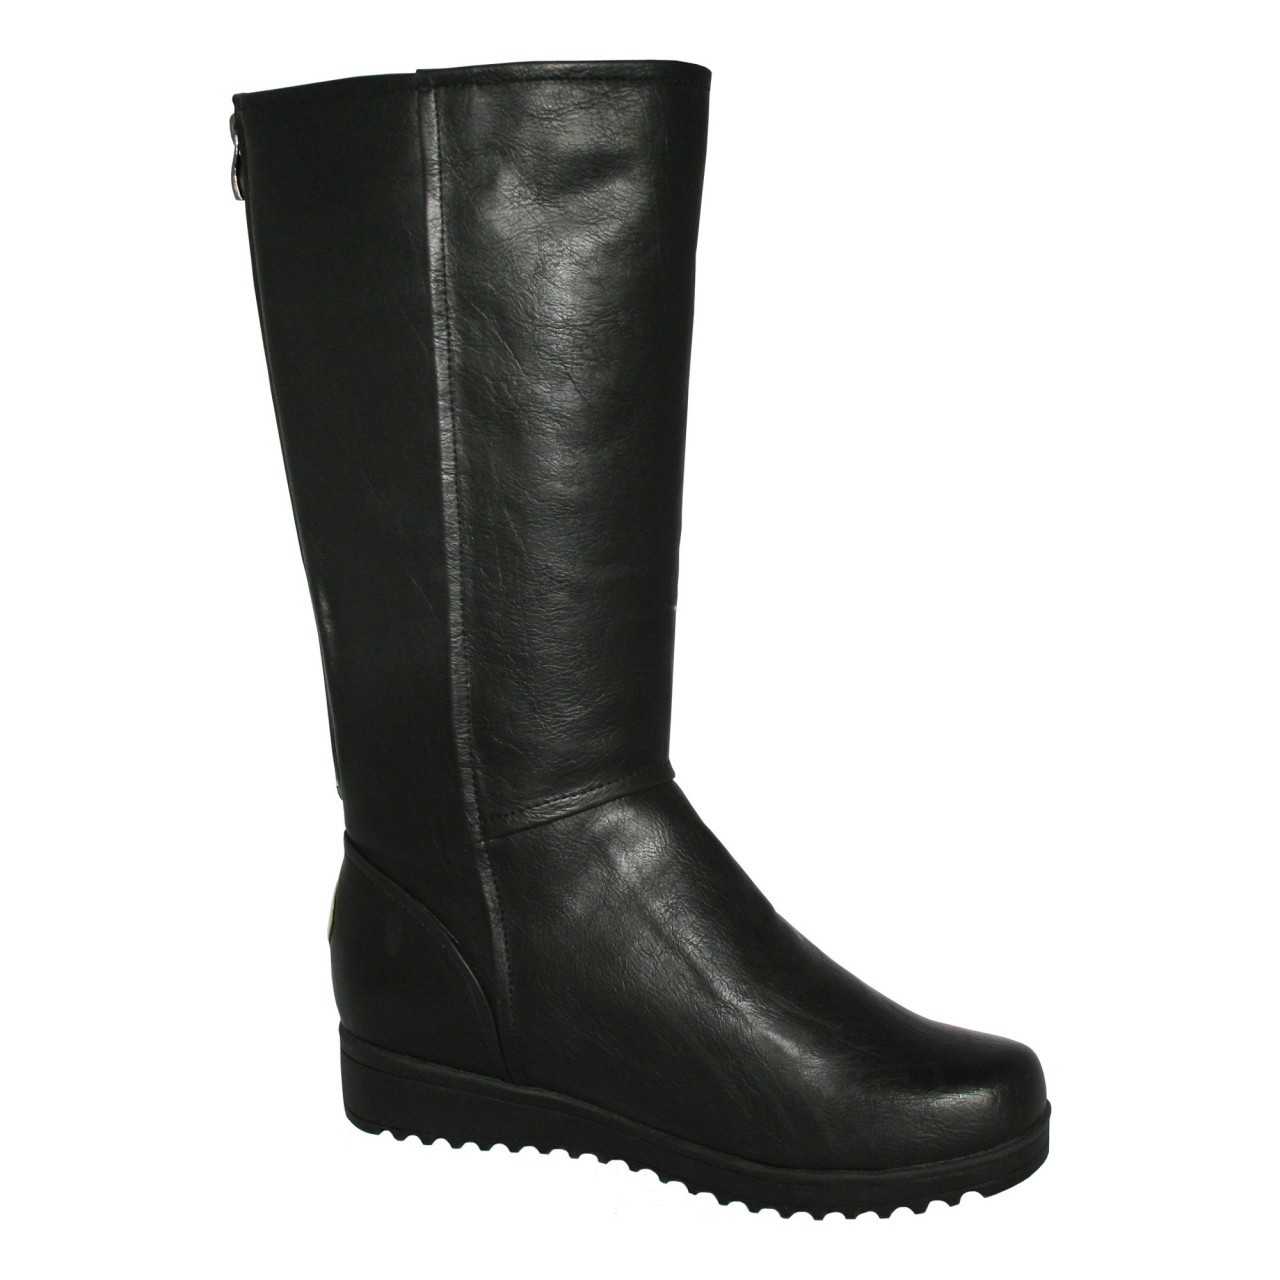 5 Warm Vegan Boots Under 100 Girliegirl Army